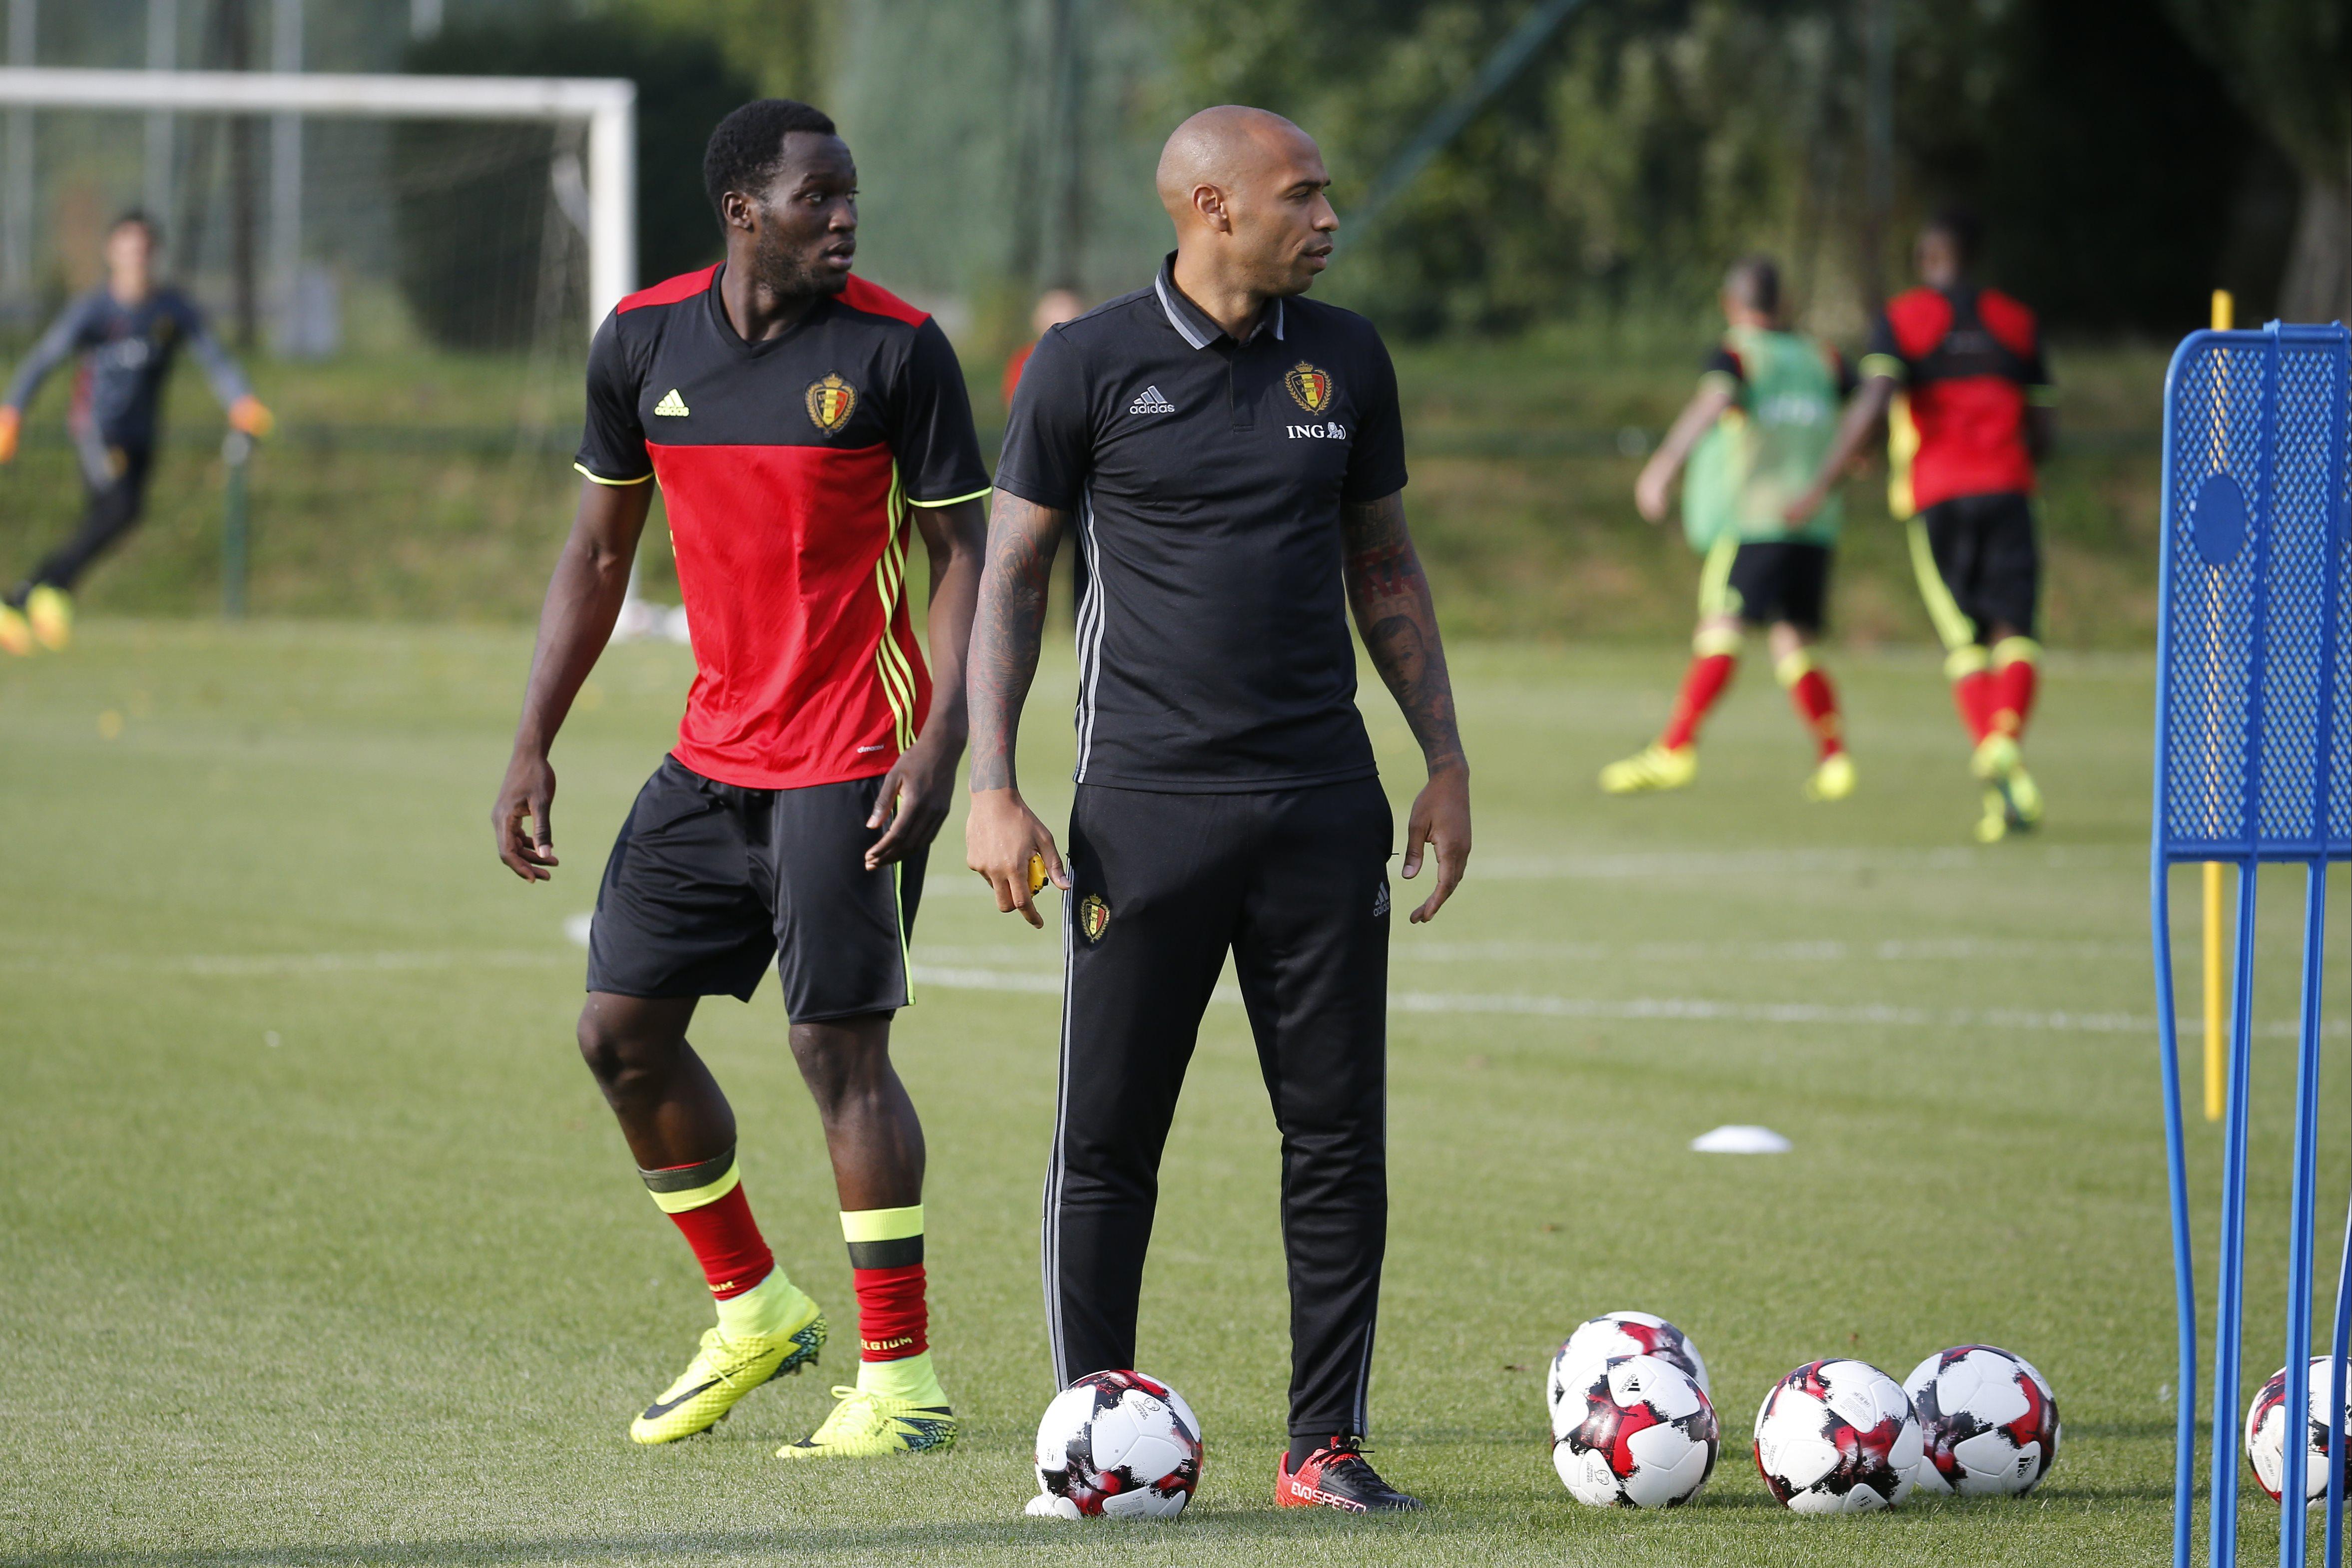 Romelu Lukaku close to reaching 'elite' level, says Arsenal legend Thierry Henry